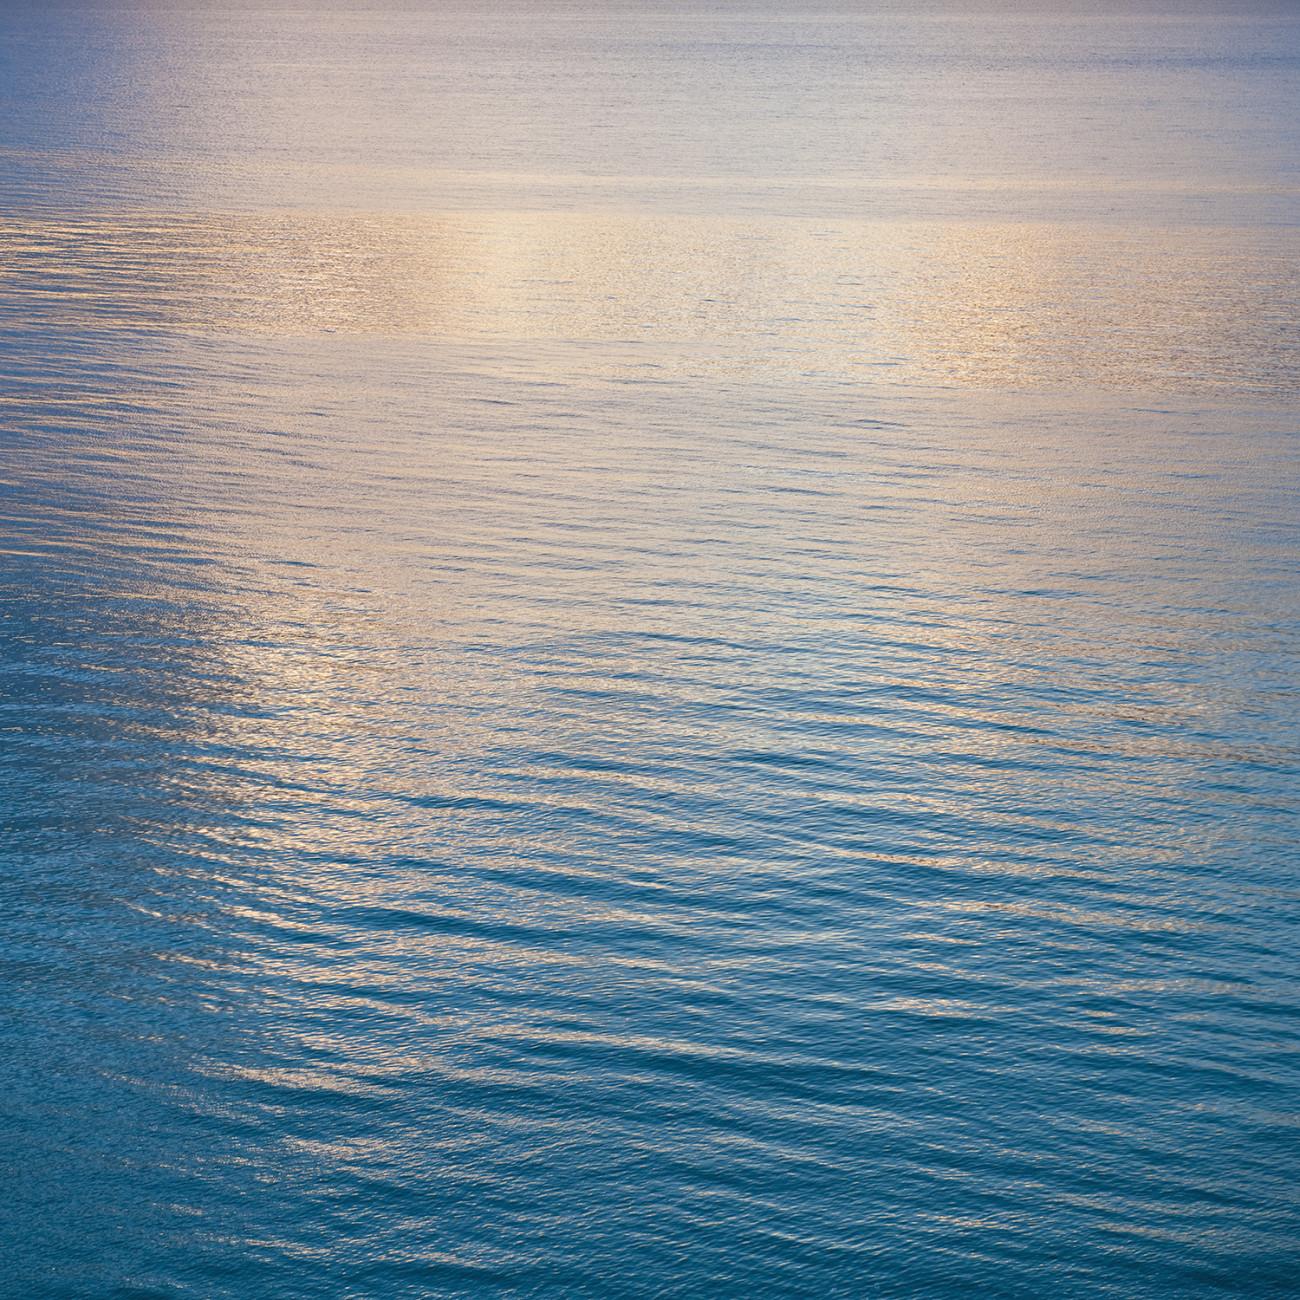 Morning reflection, Atlantic Ocean, Study 2, 2009